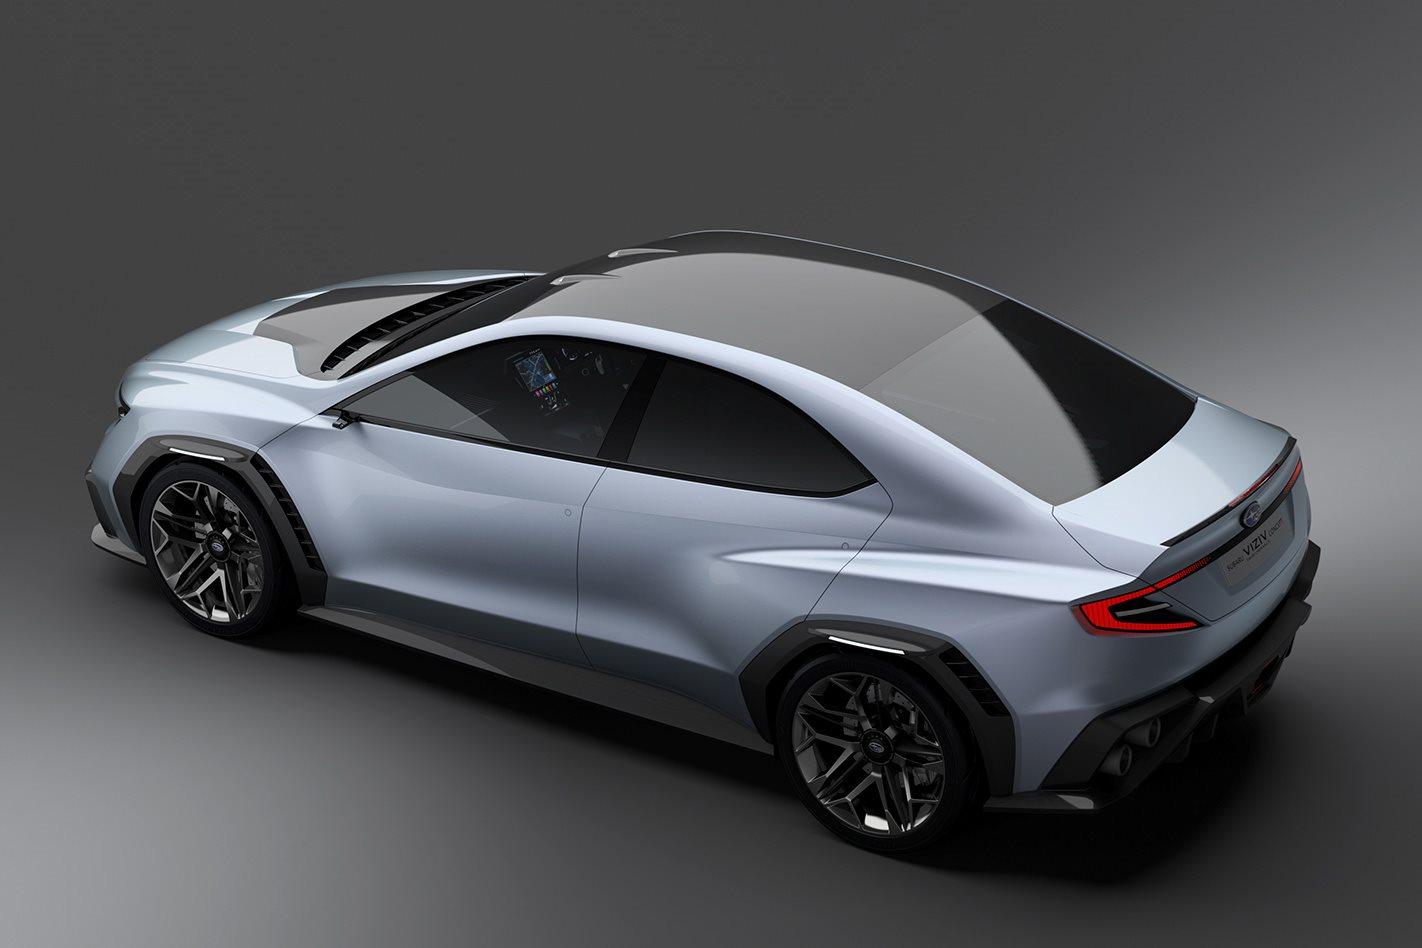 Subaru-Viziv-concept-car-exterior.jpg